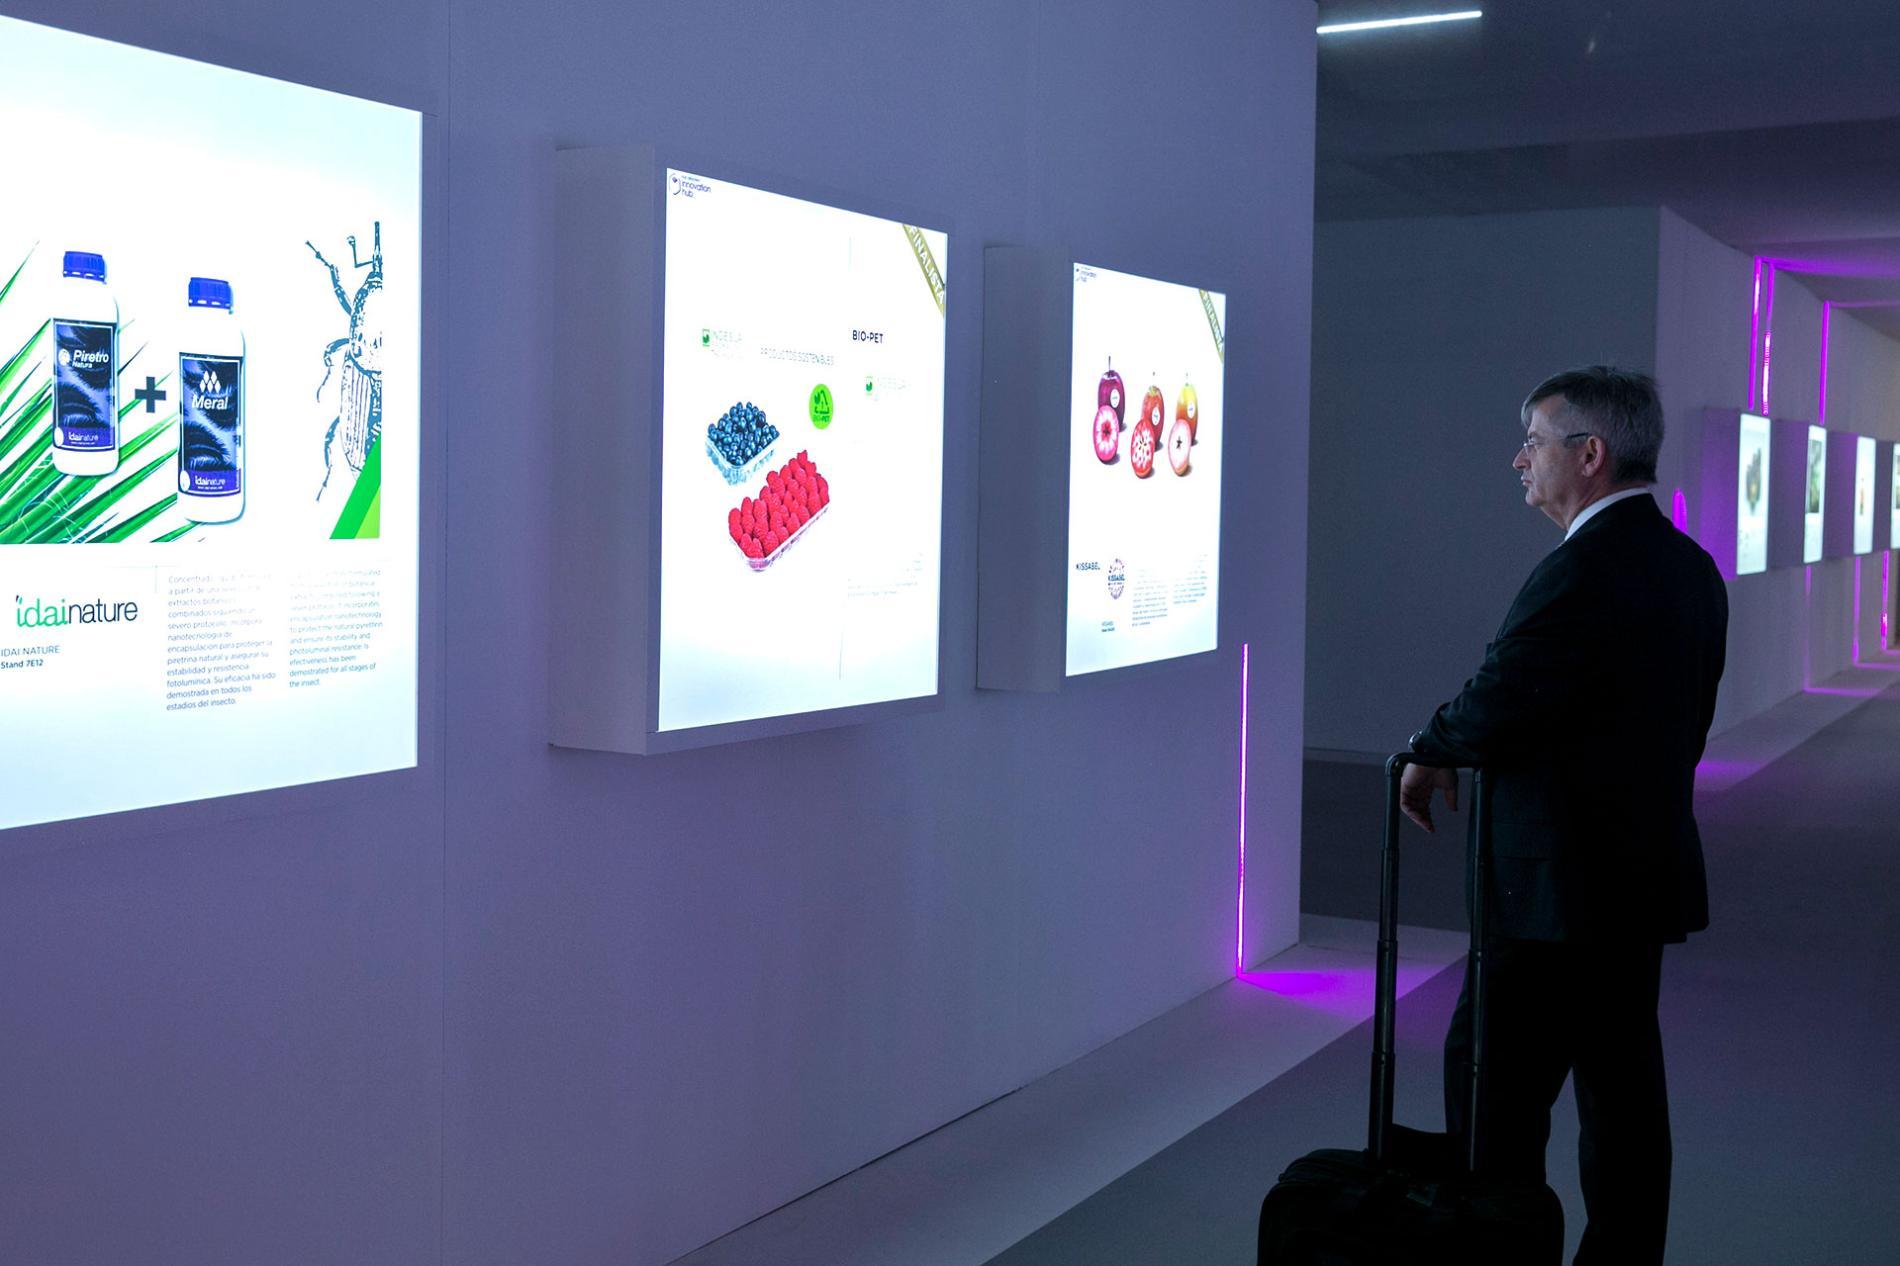 Visitante observando paneles de información